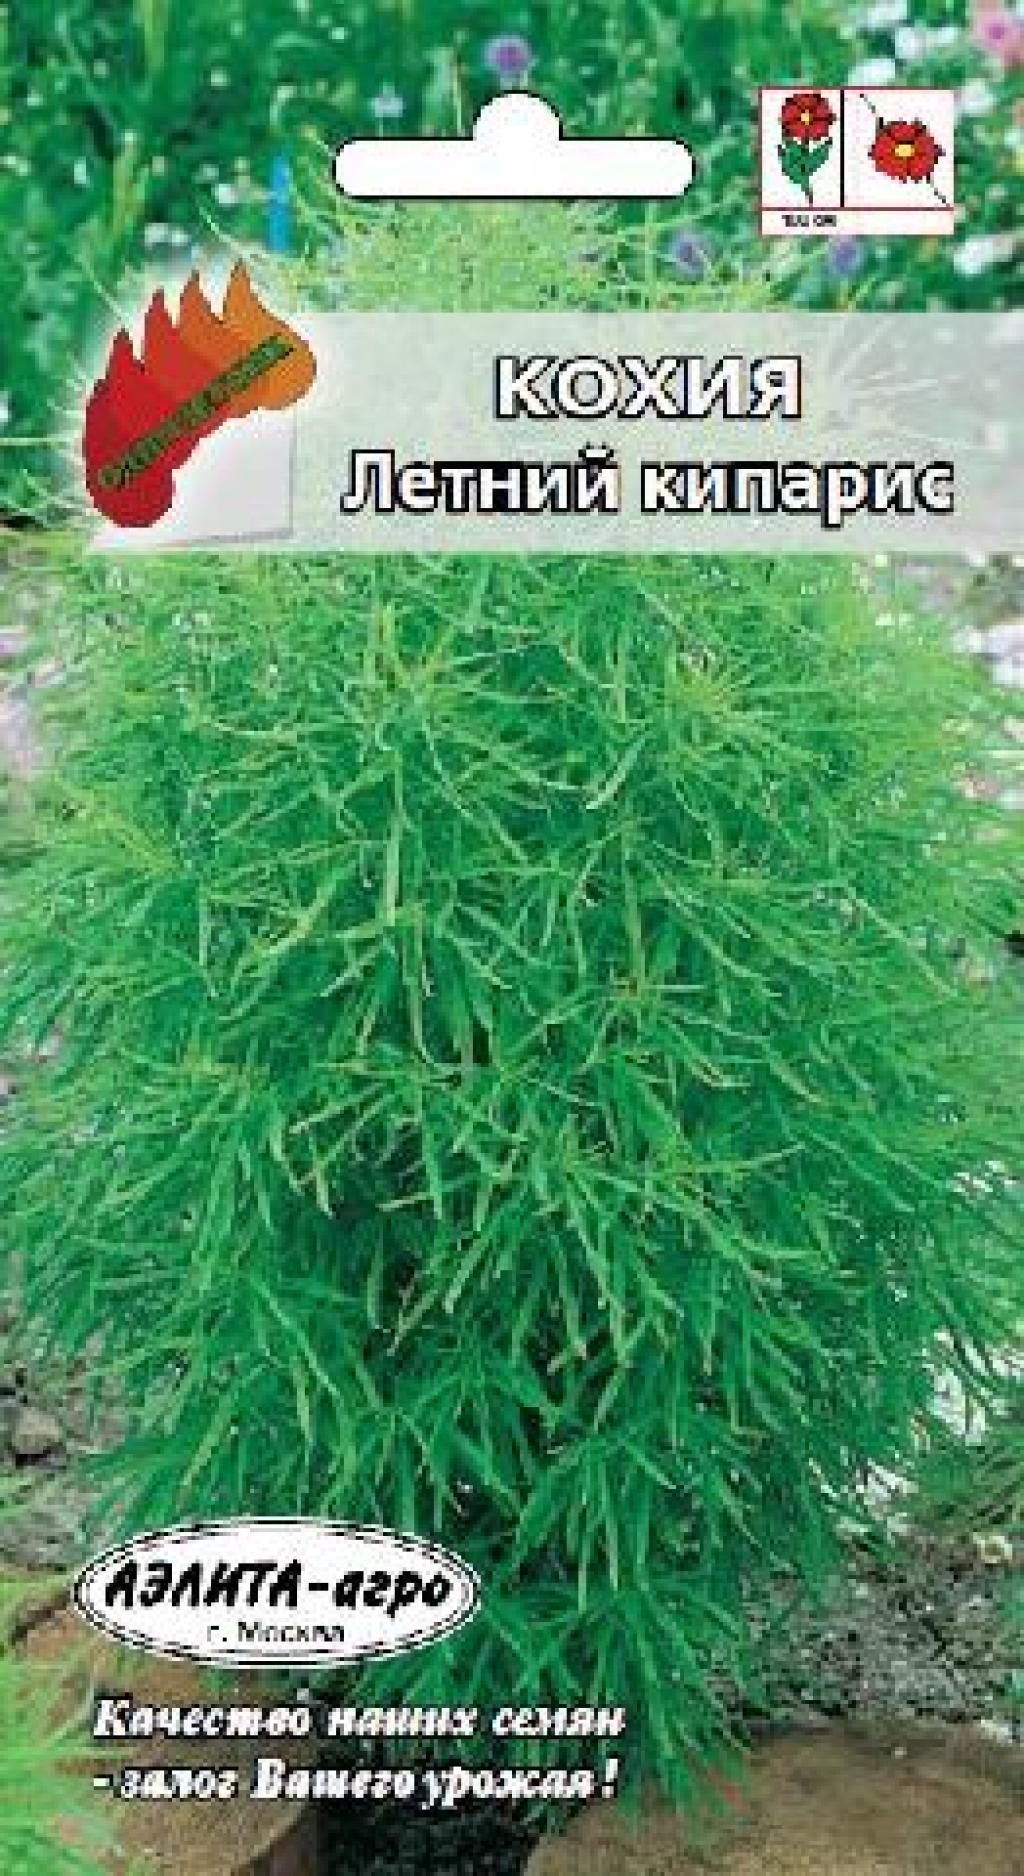 Кохия летний кипарис выращивание из семян 82